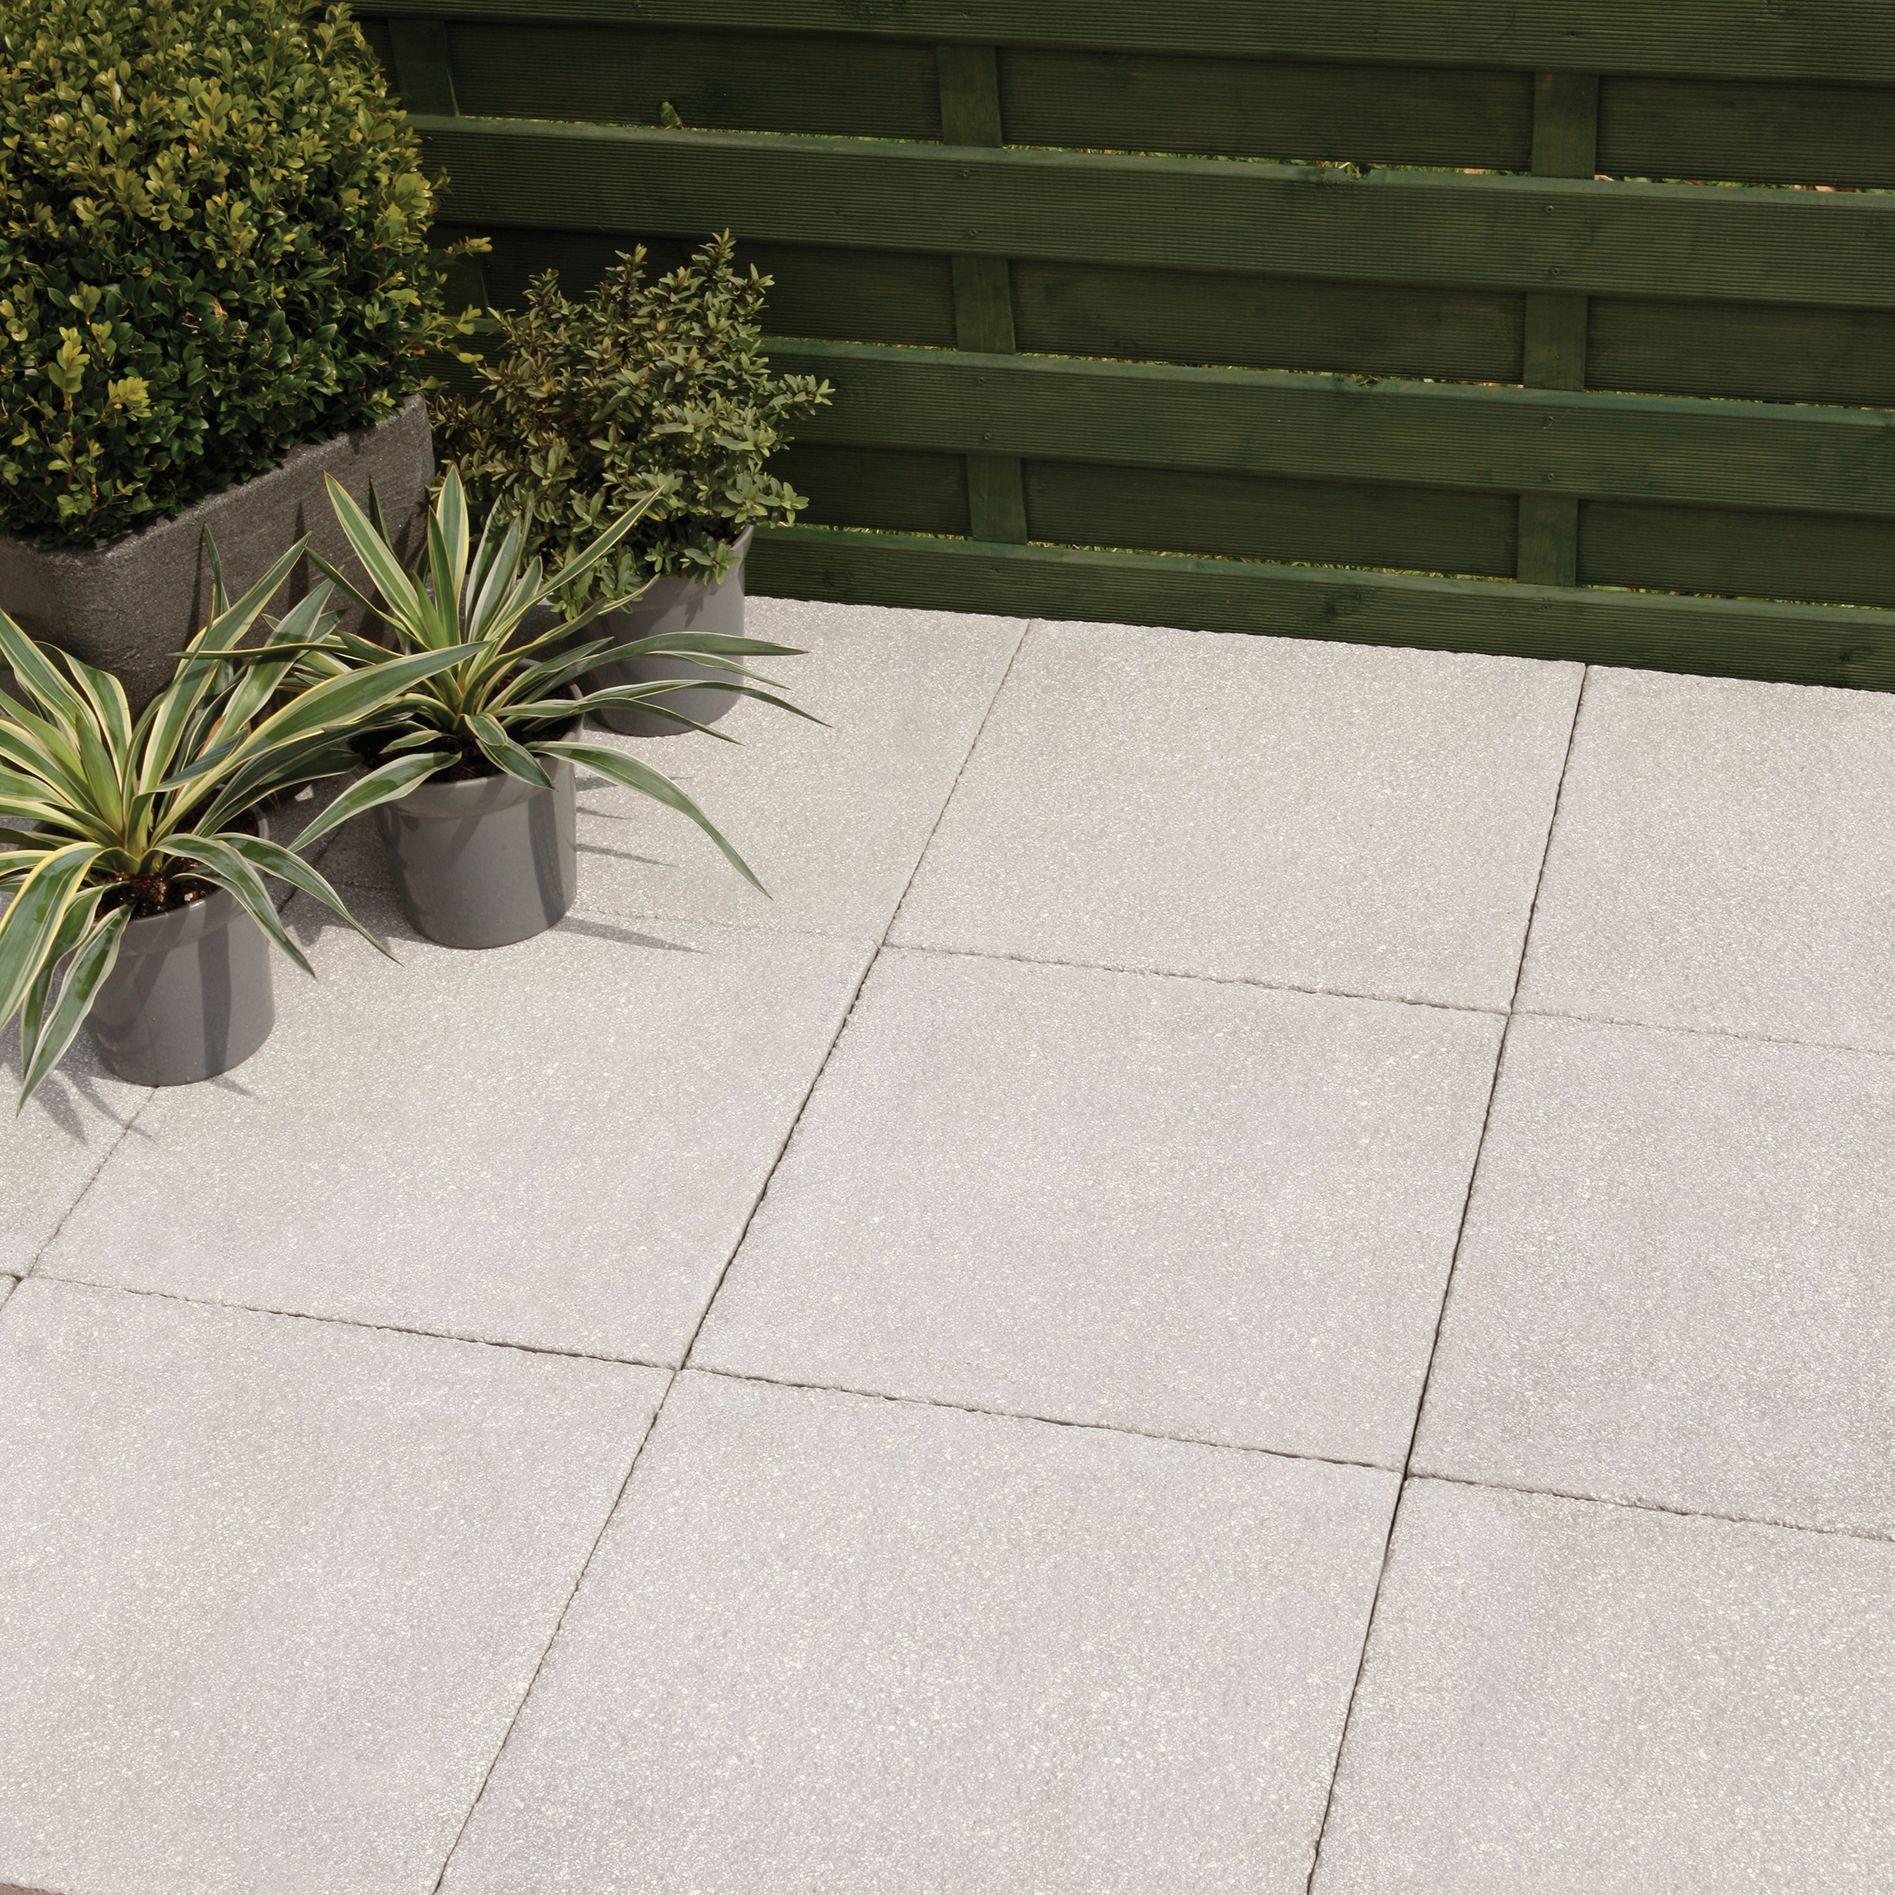 paving slabs grey textured single paving slab (l)450mm (w)450mm | departments | diy at EMJYAPM